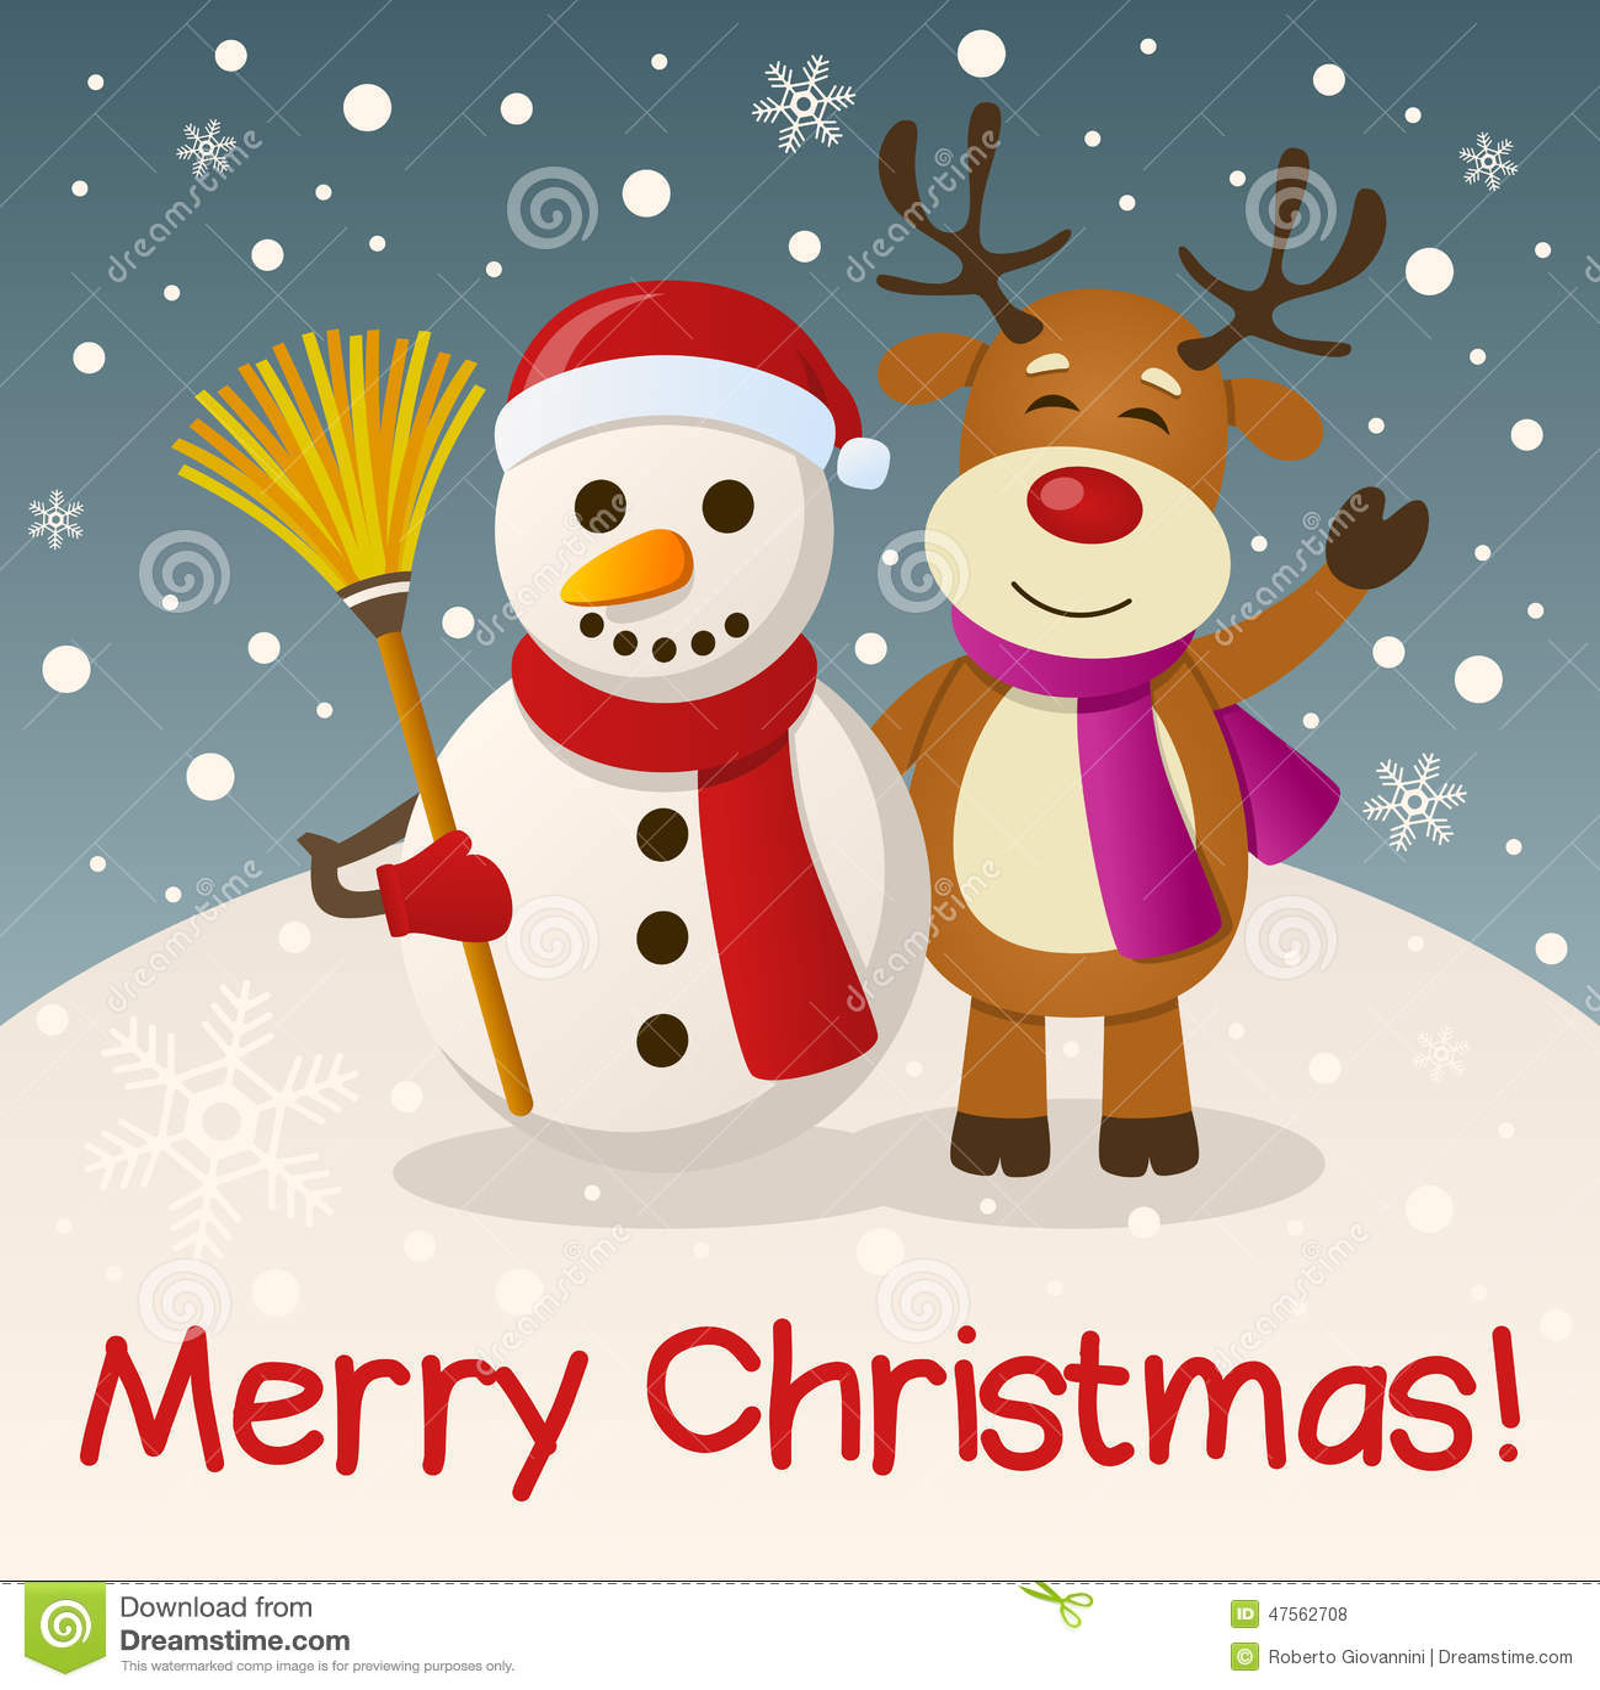 Christmas Snowman Amp Reindeer Stock Vector Image 47562708